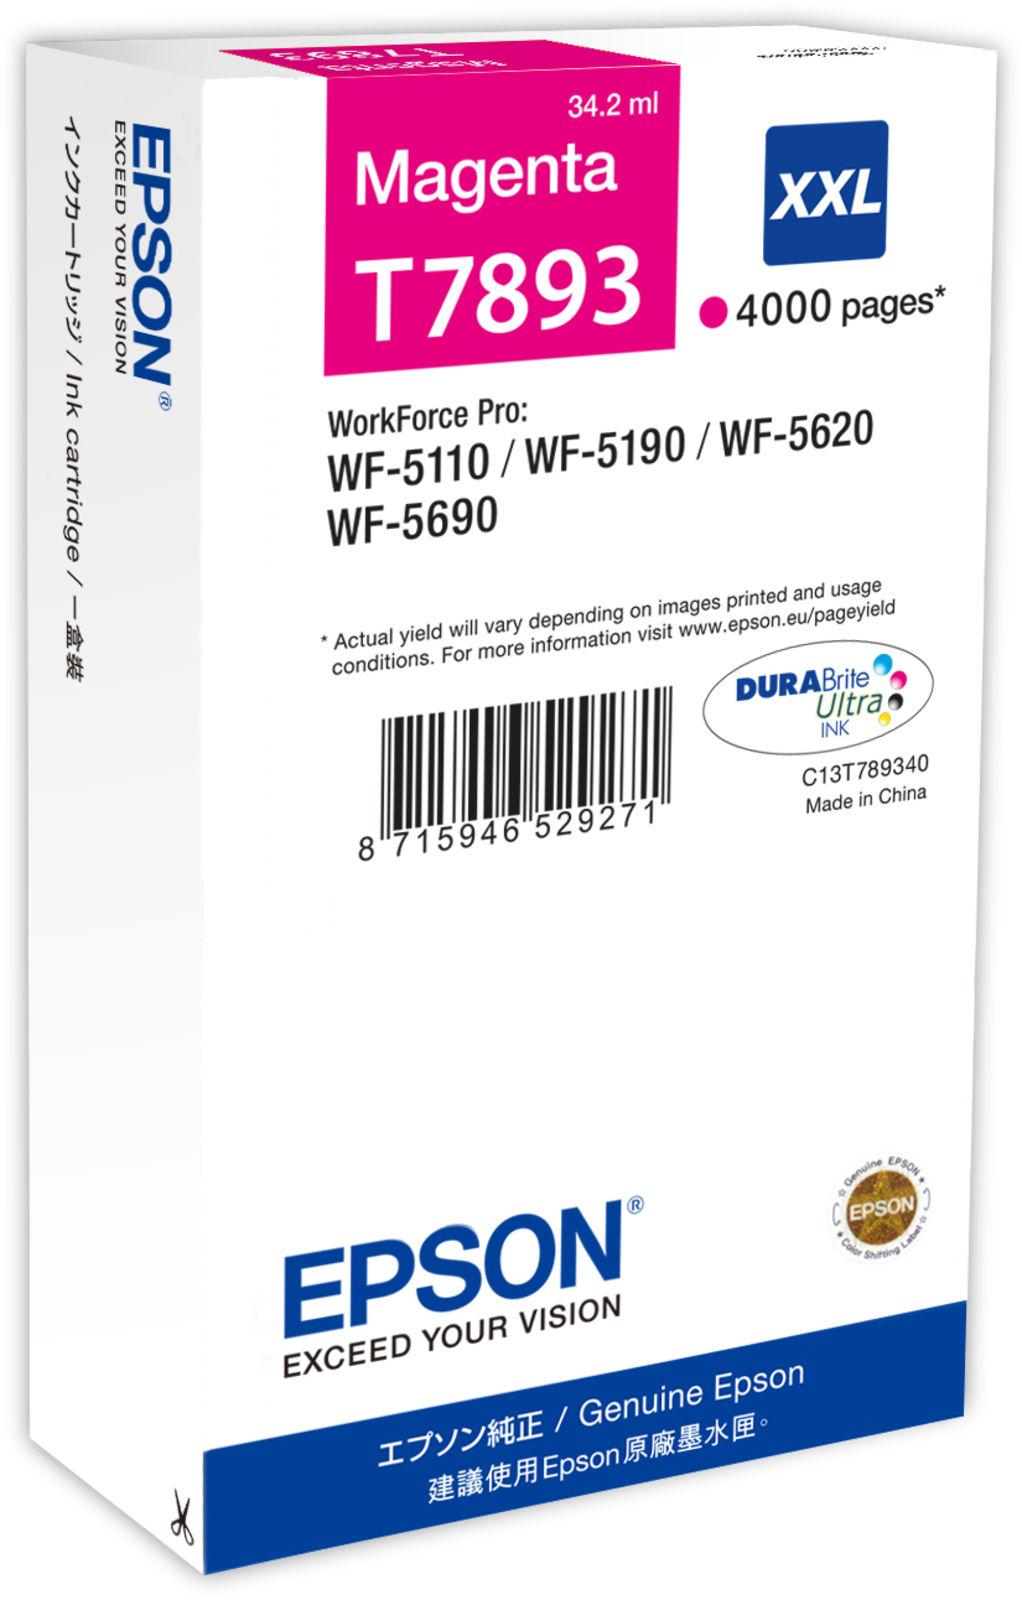 Epson Ink Cartridge XXL Magenta